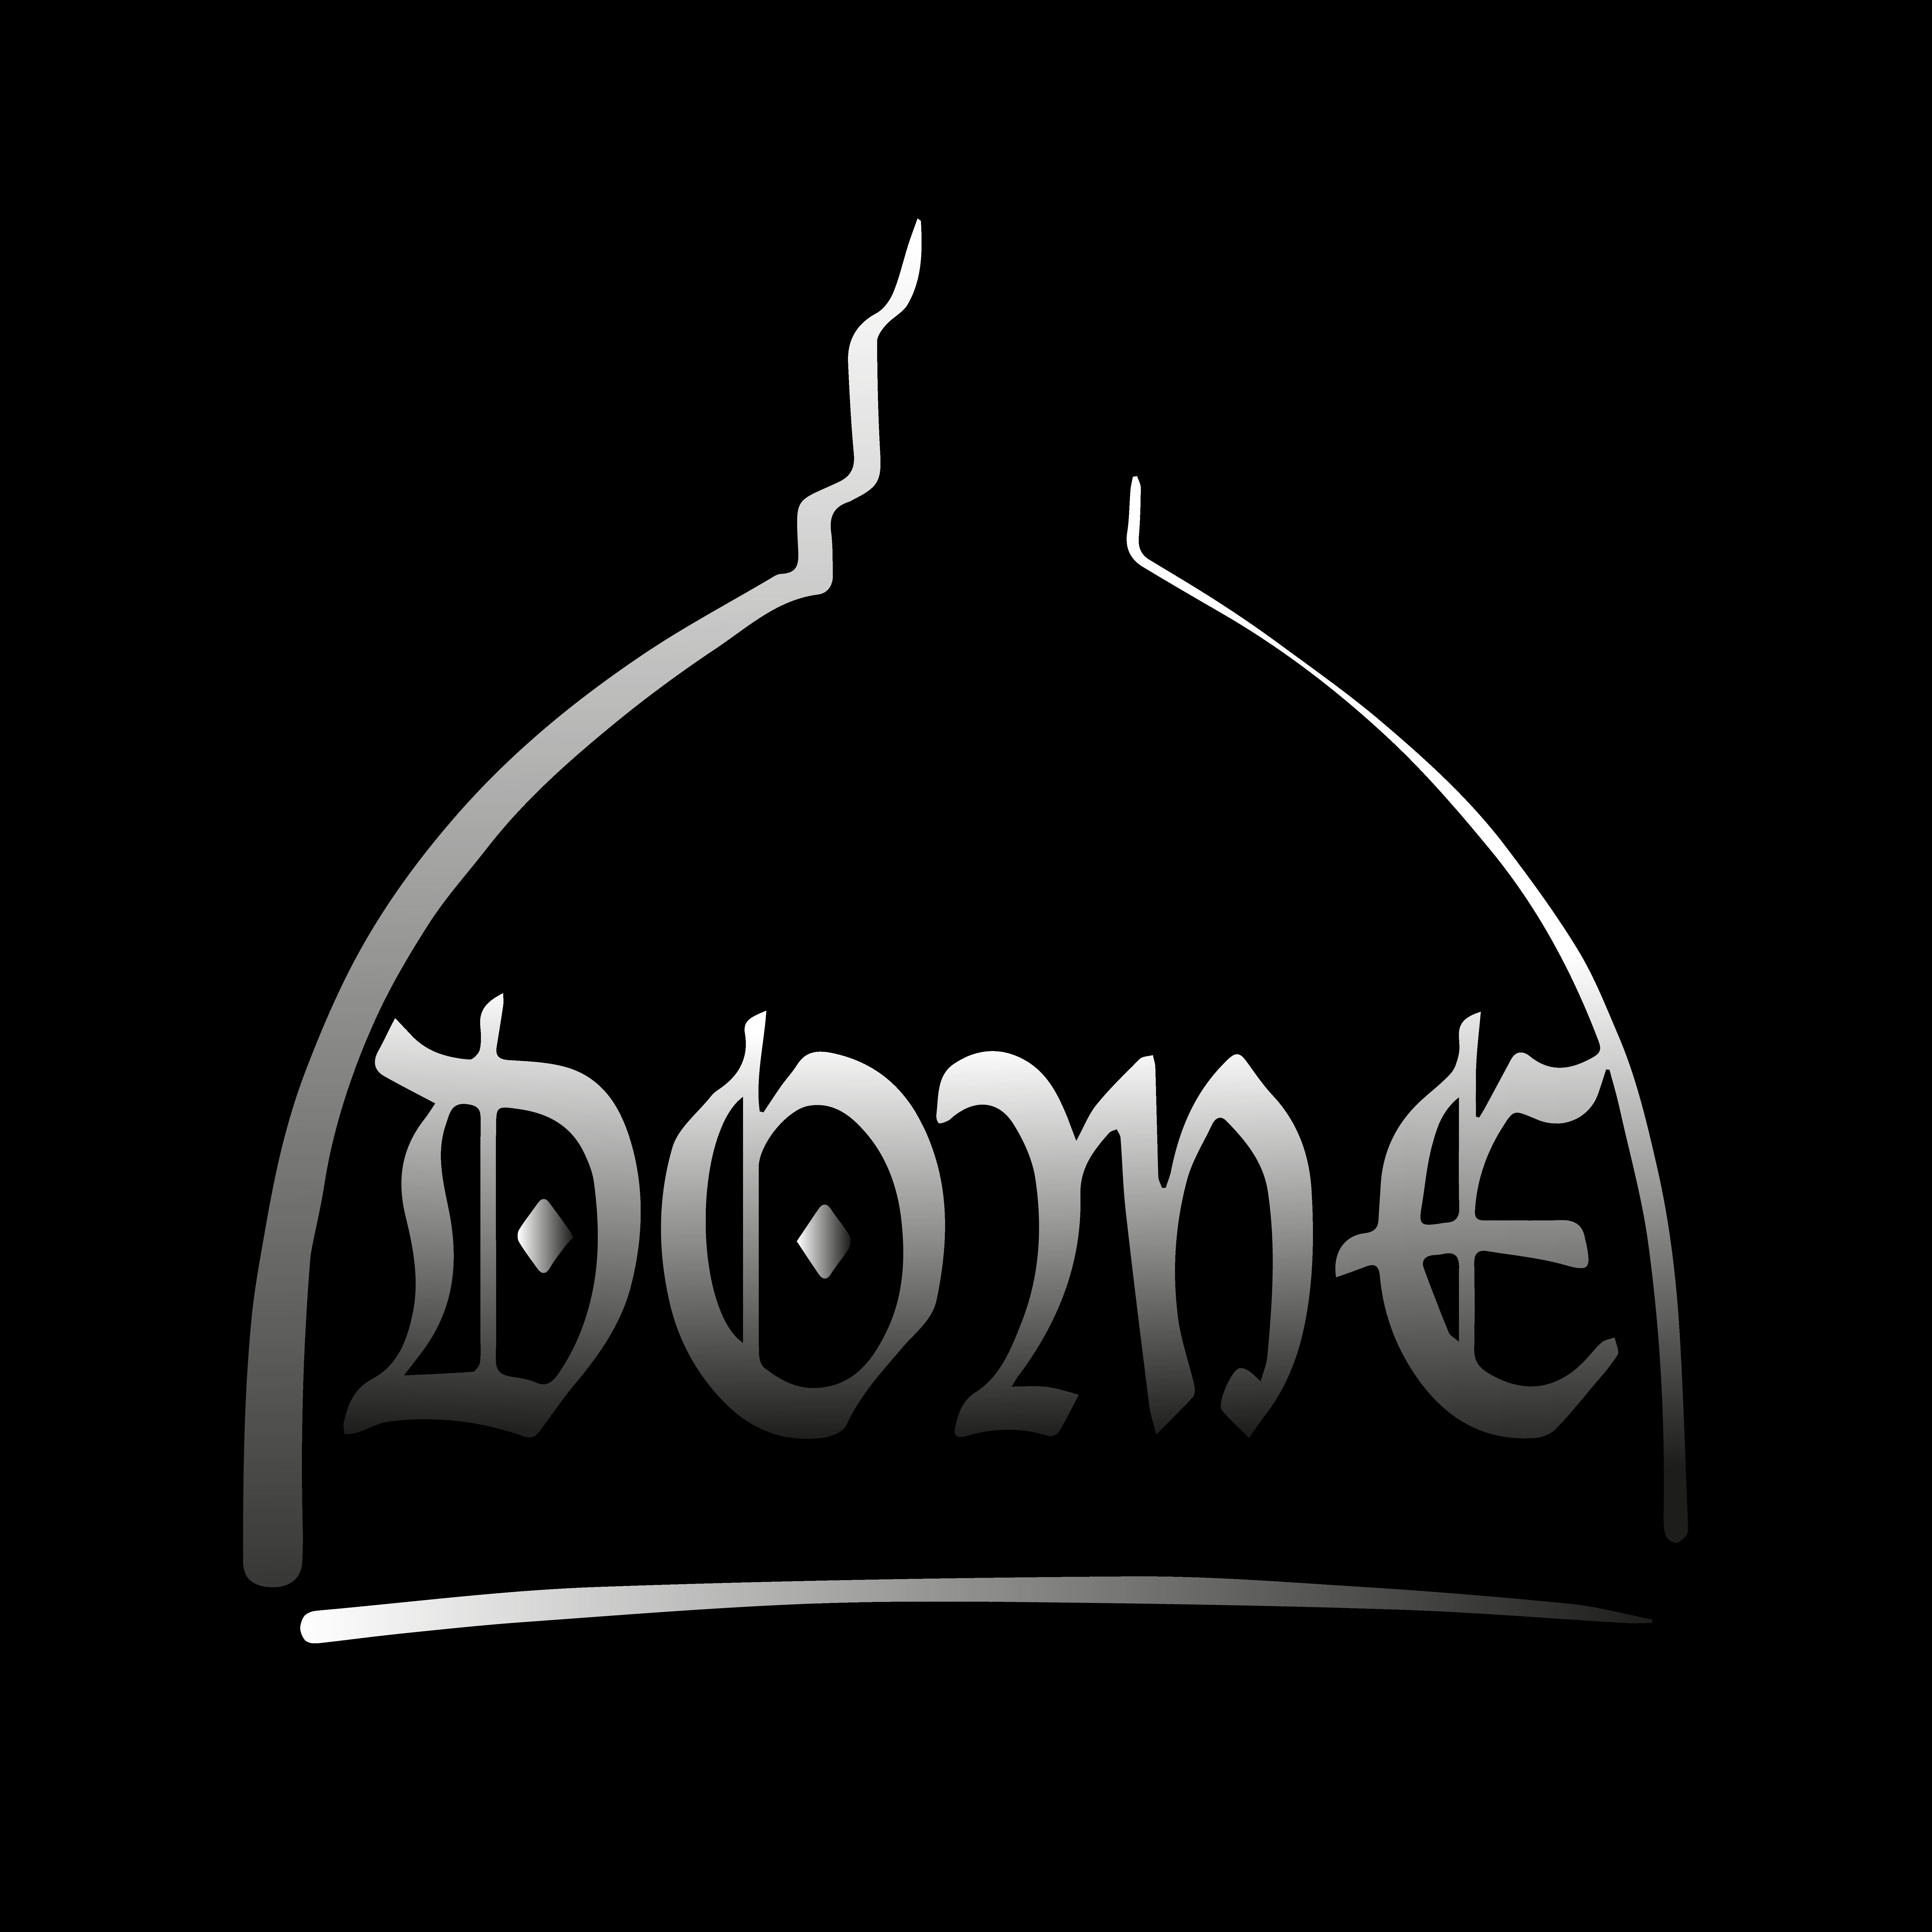 DOME RECORDINGS® (dome_recordings) Profile Image | Linktree